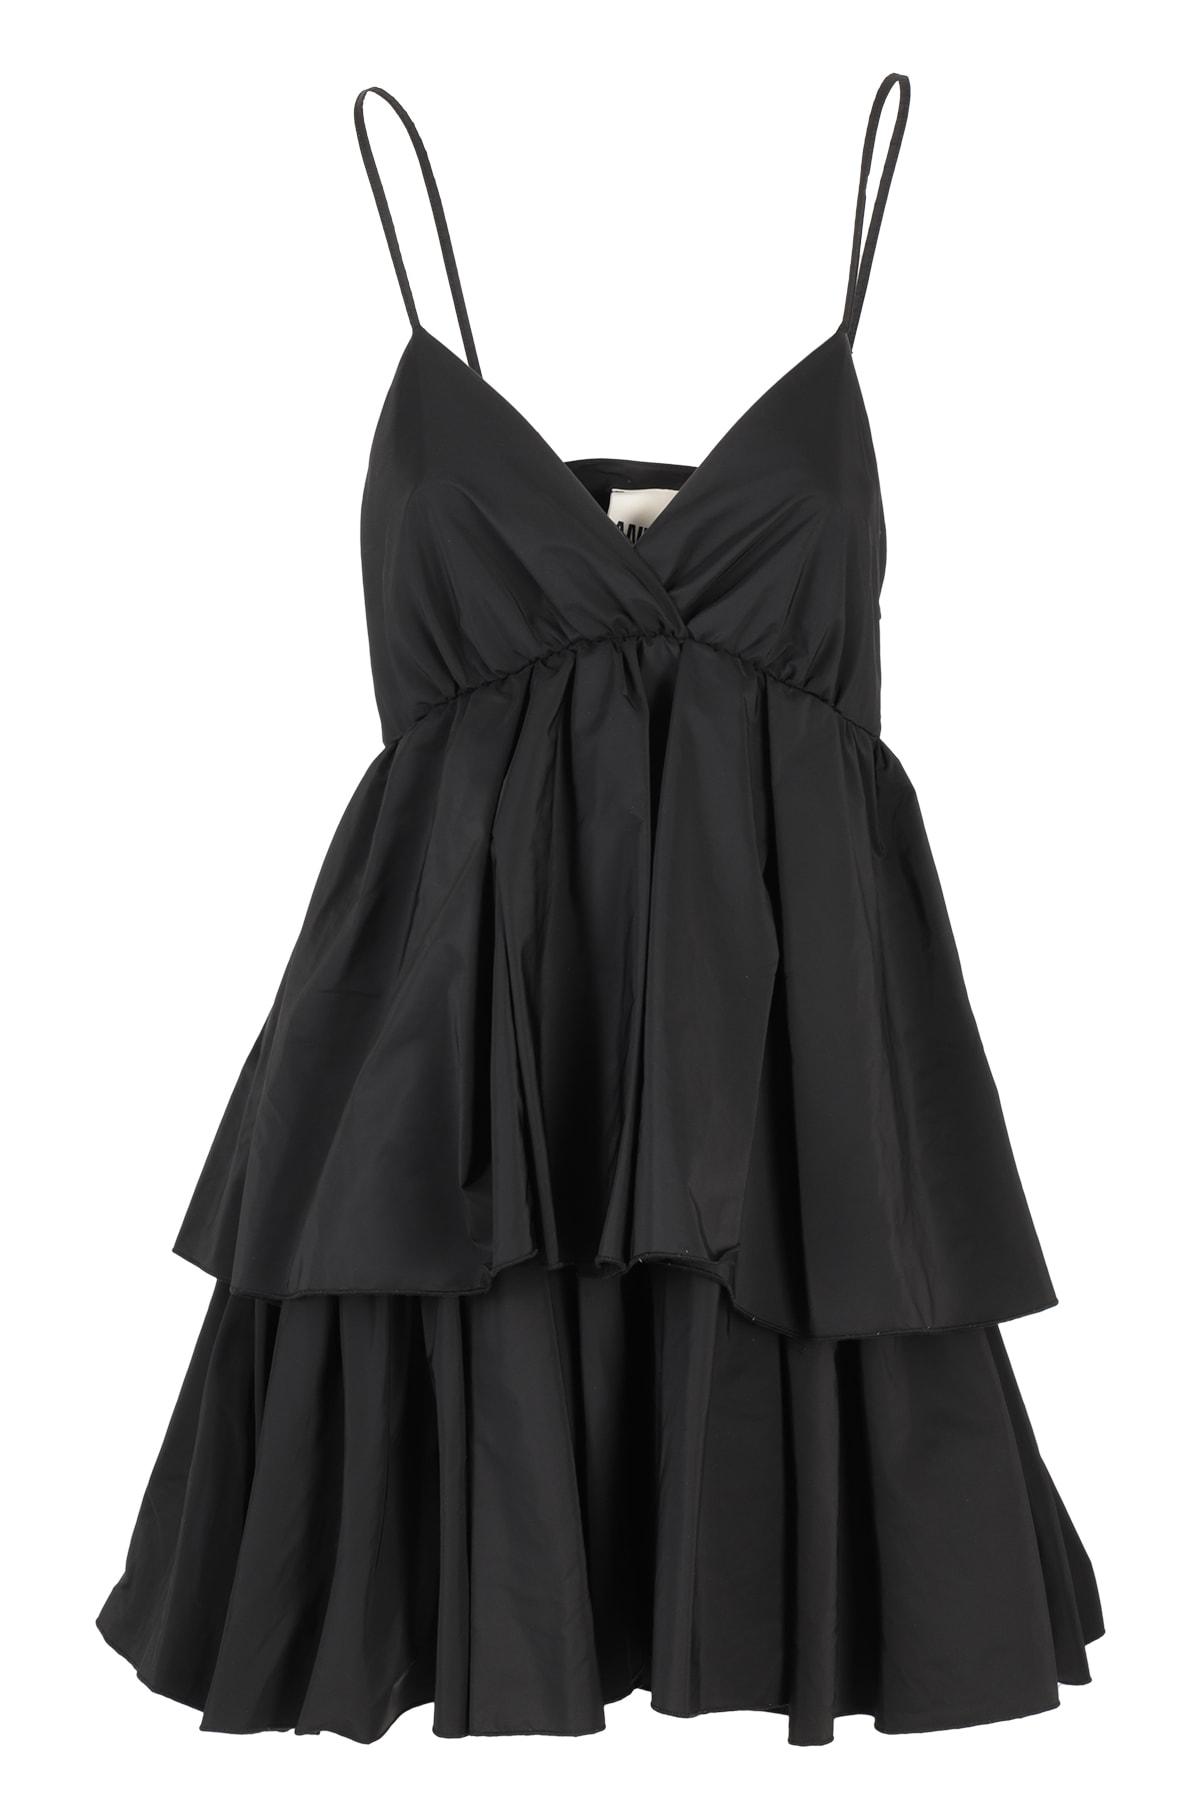 Aniye By Dresses DRESS